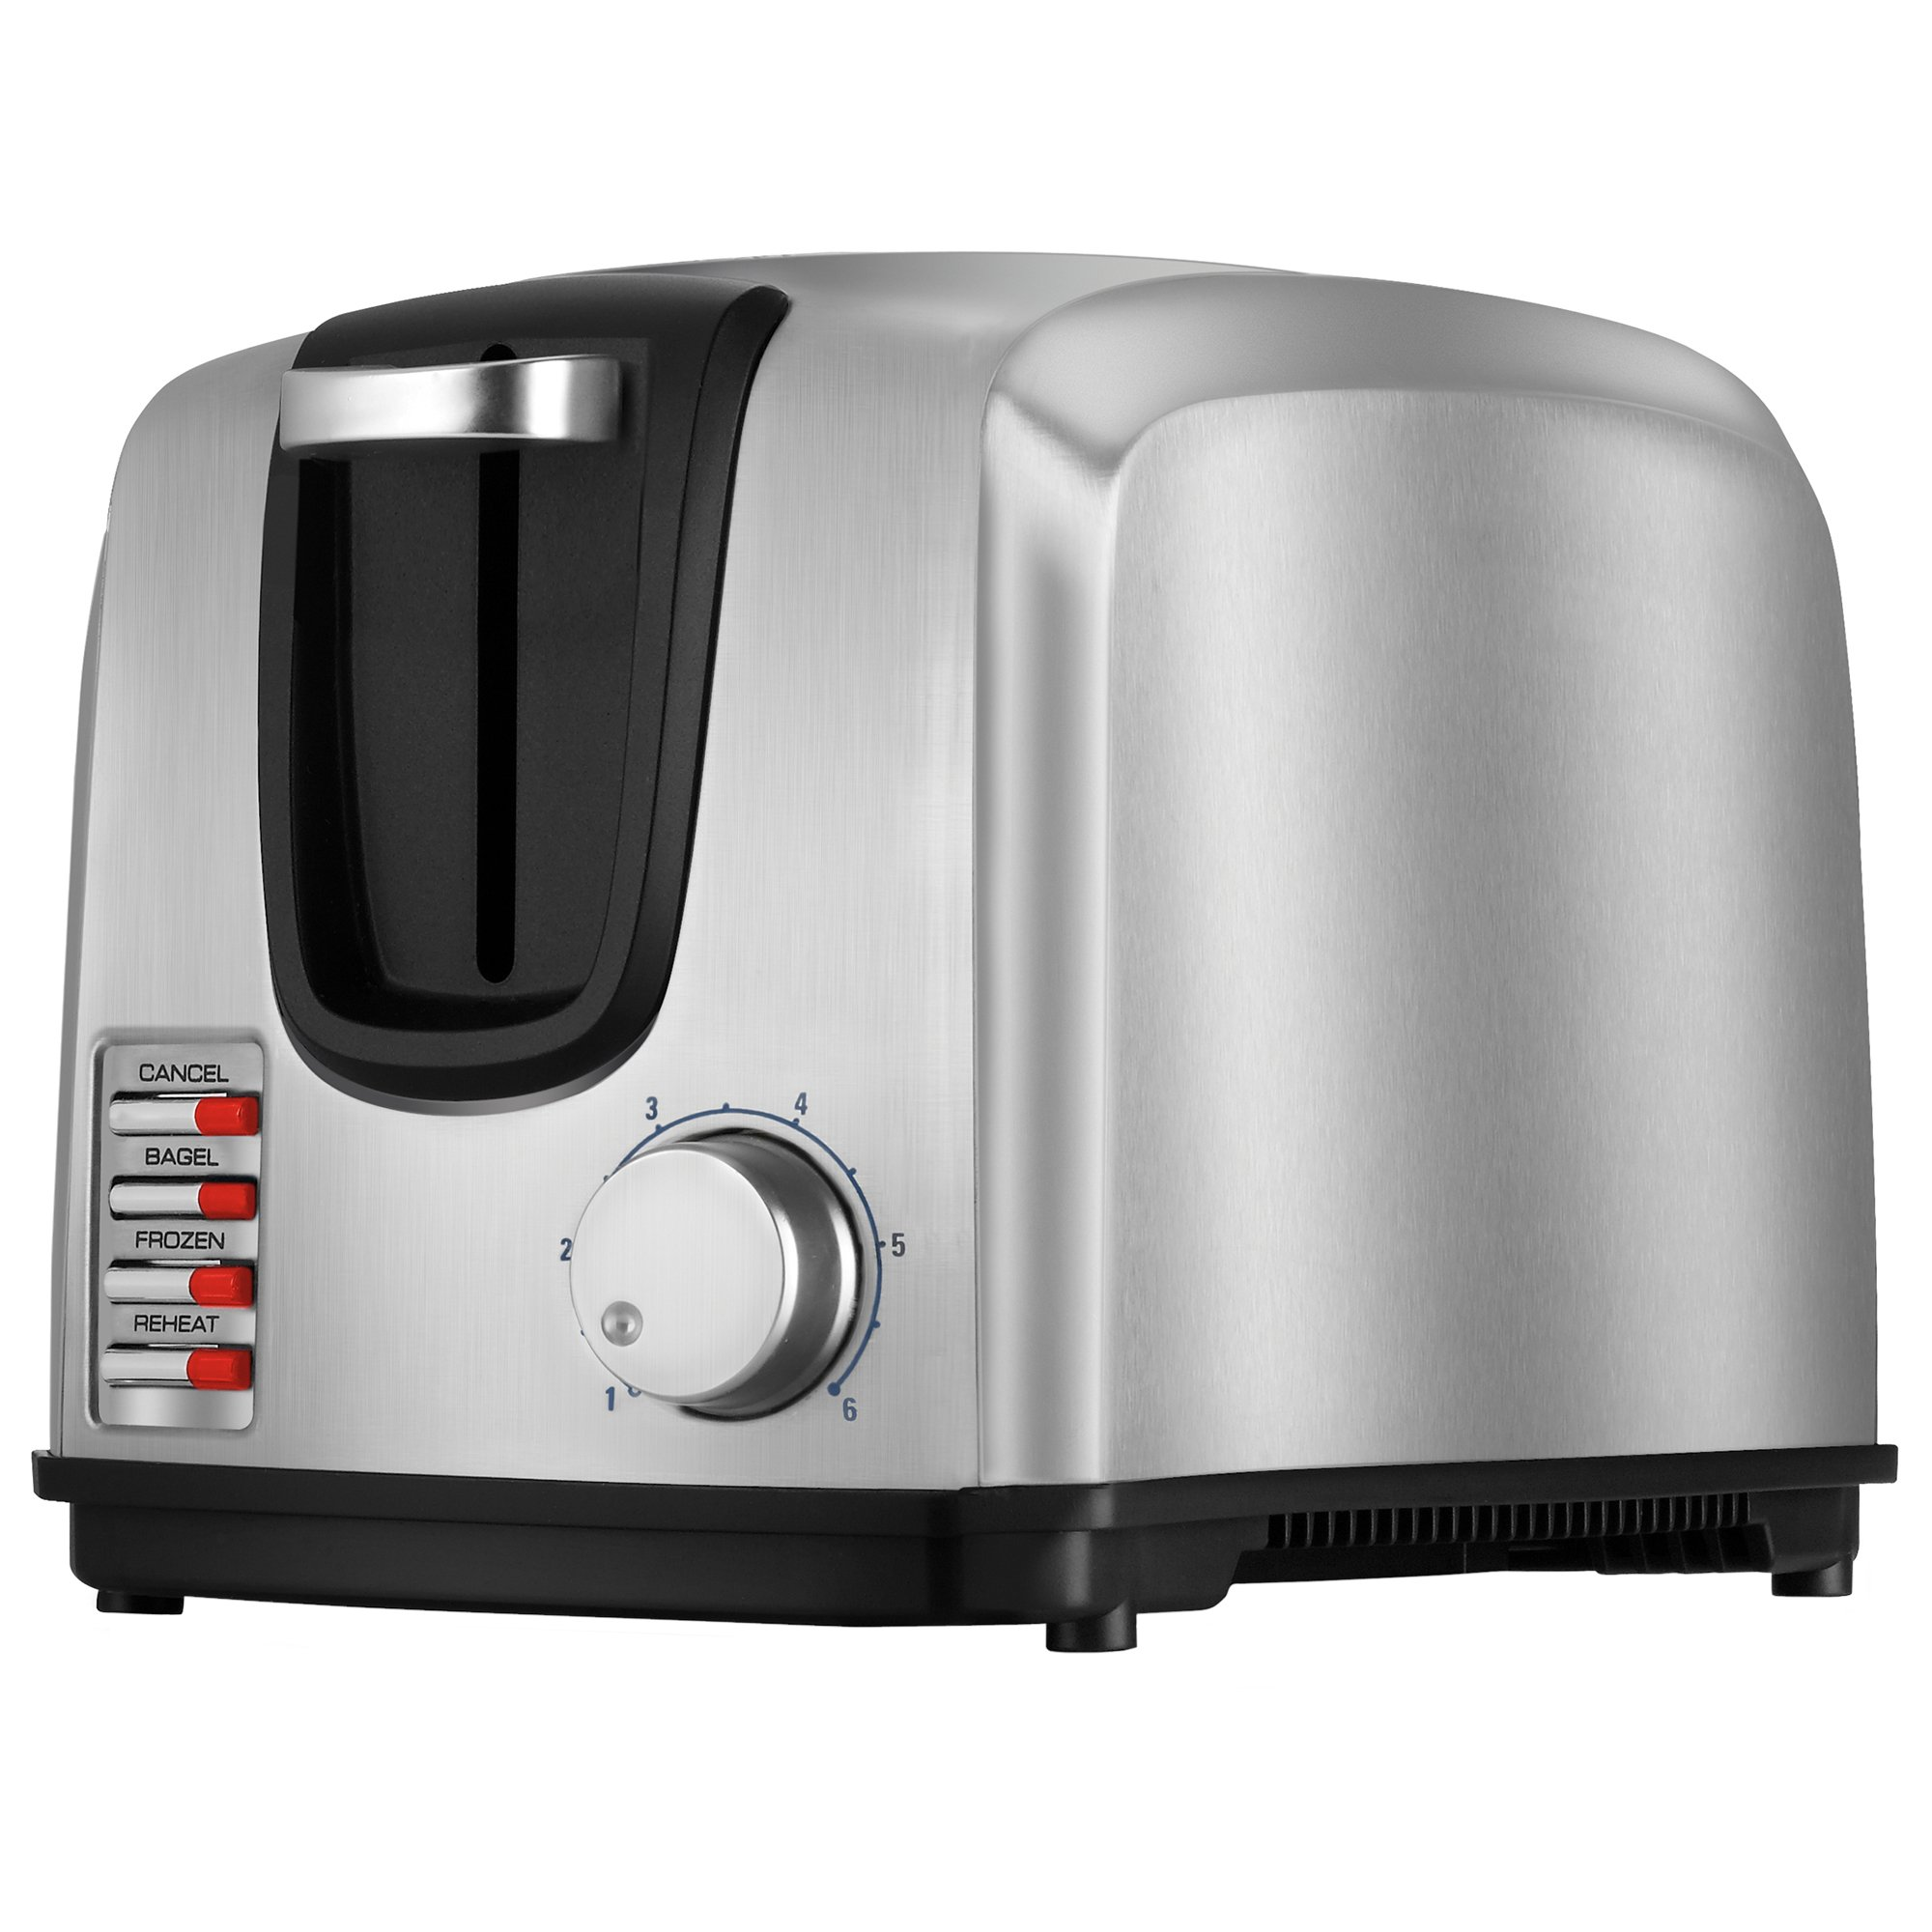 BLACK+DECKER 2-Slice Toaster, Modern, Stainless Steel, T2707S